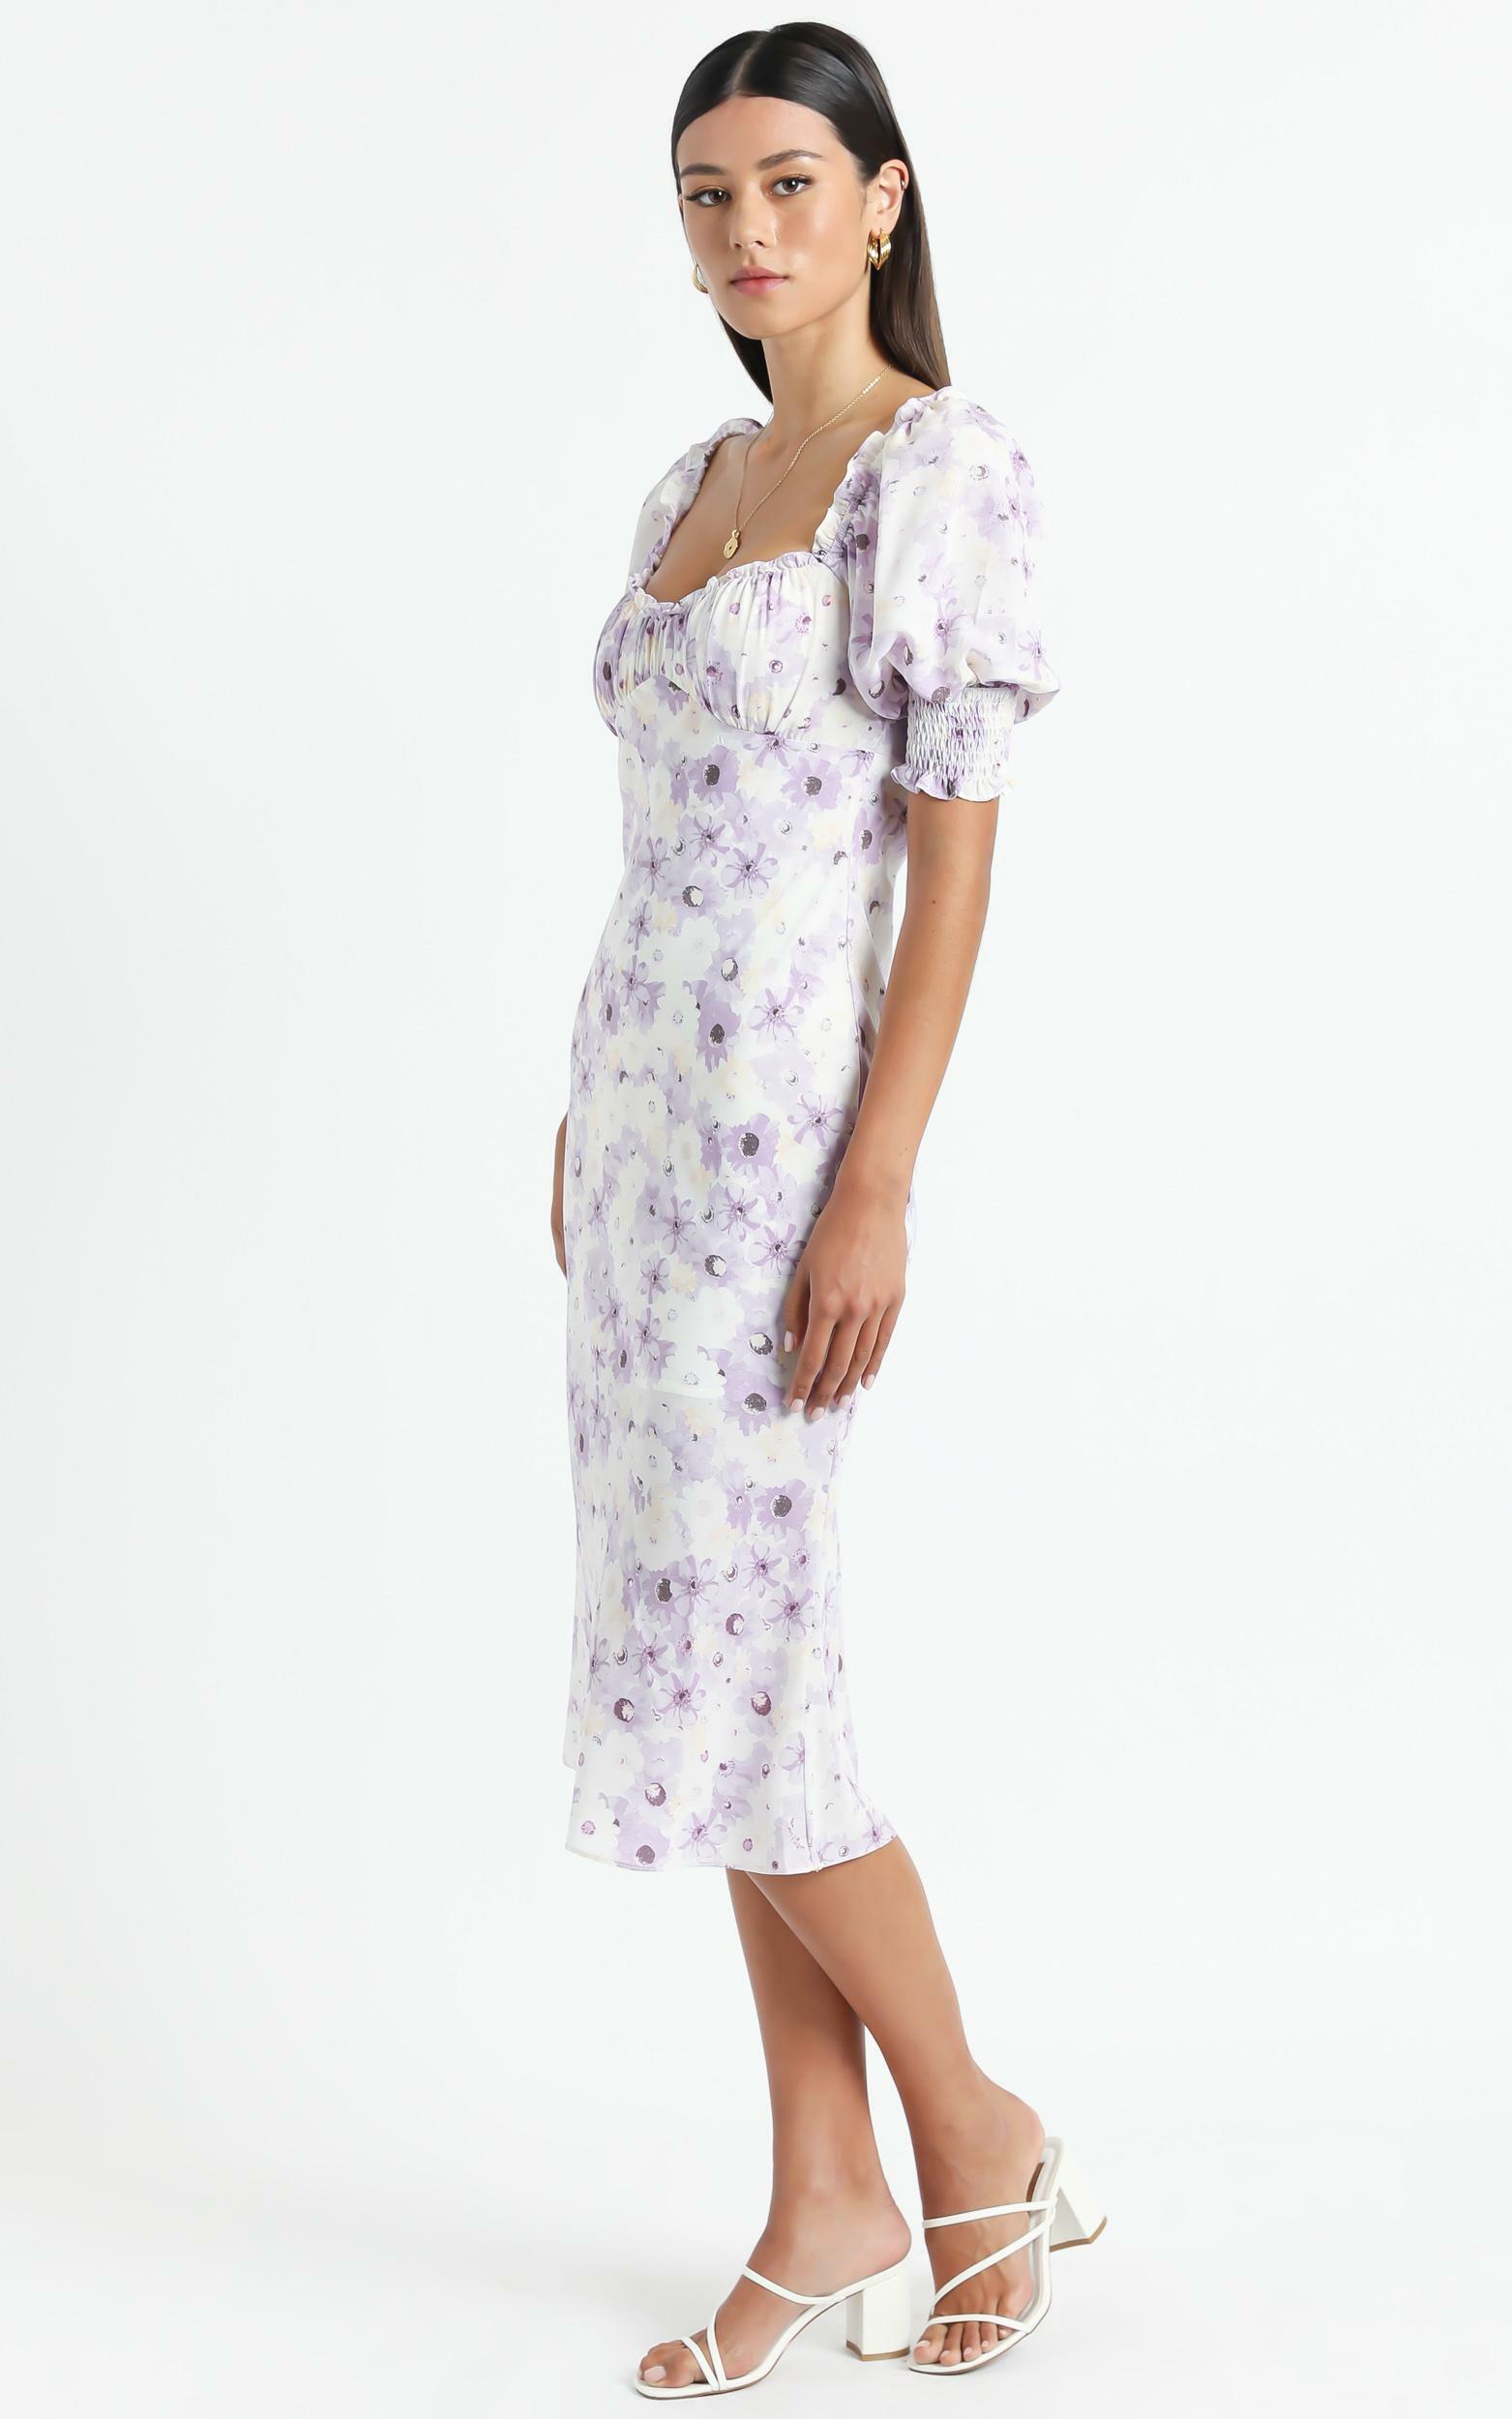 Missouri Dress in Lilac Floral - 06, PRP1, hi-res image number null